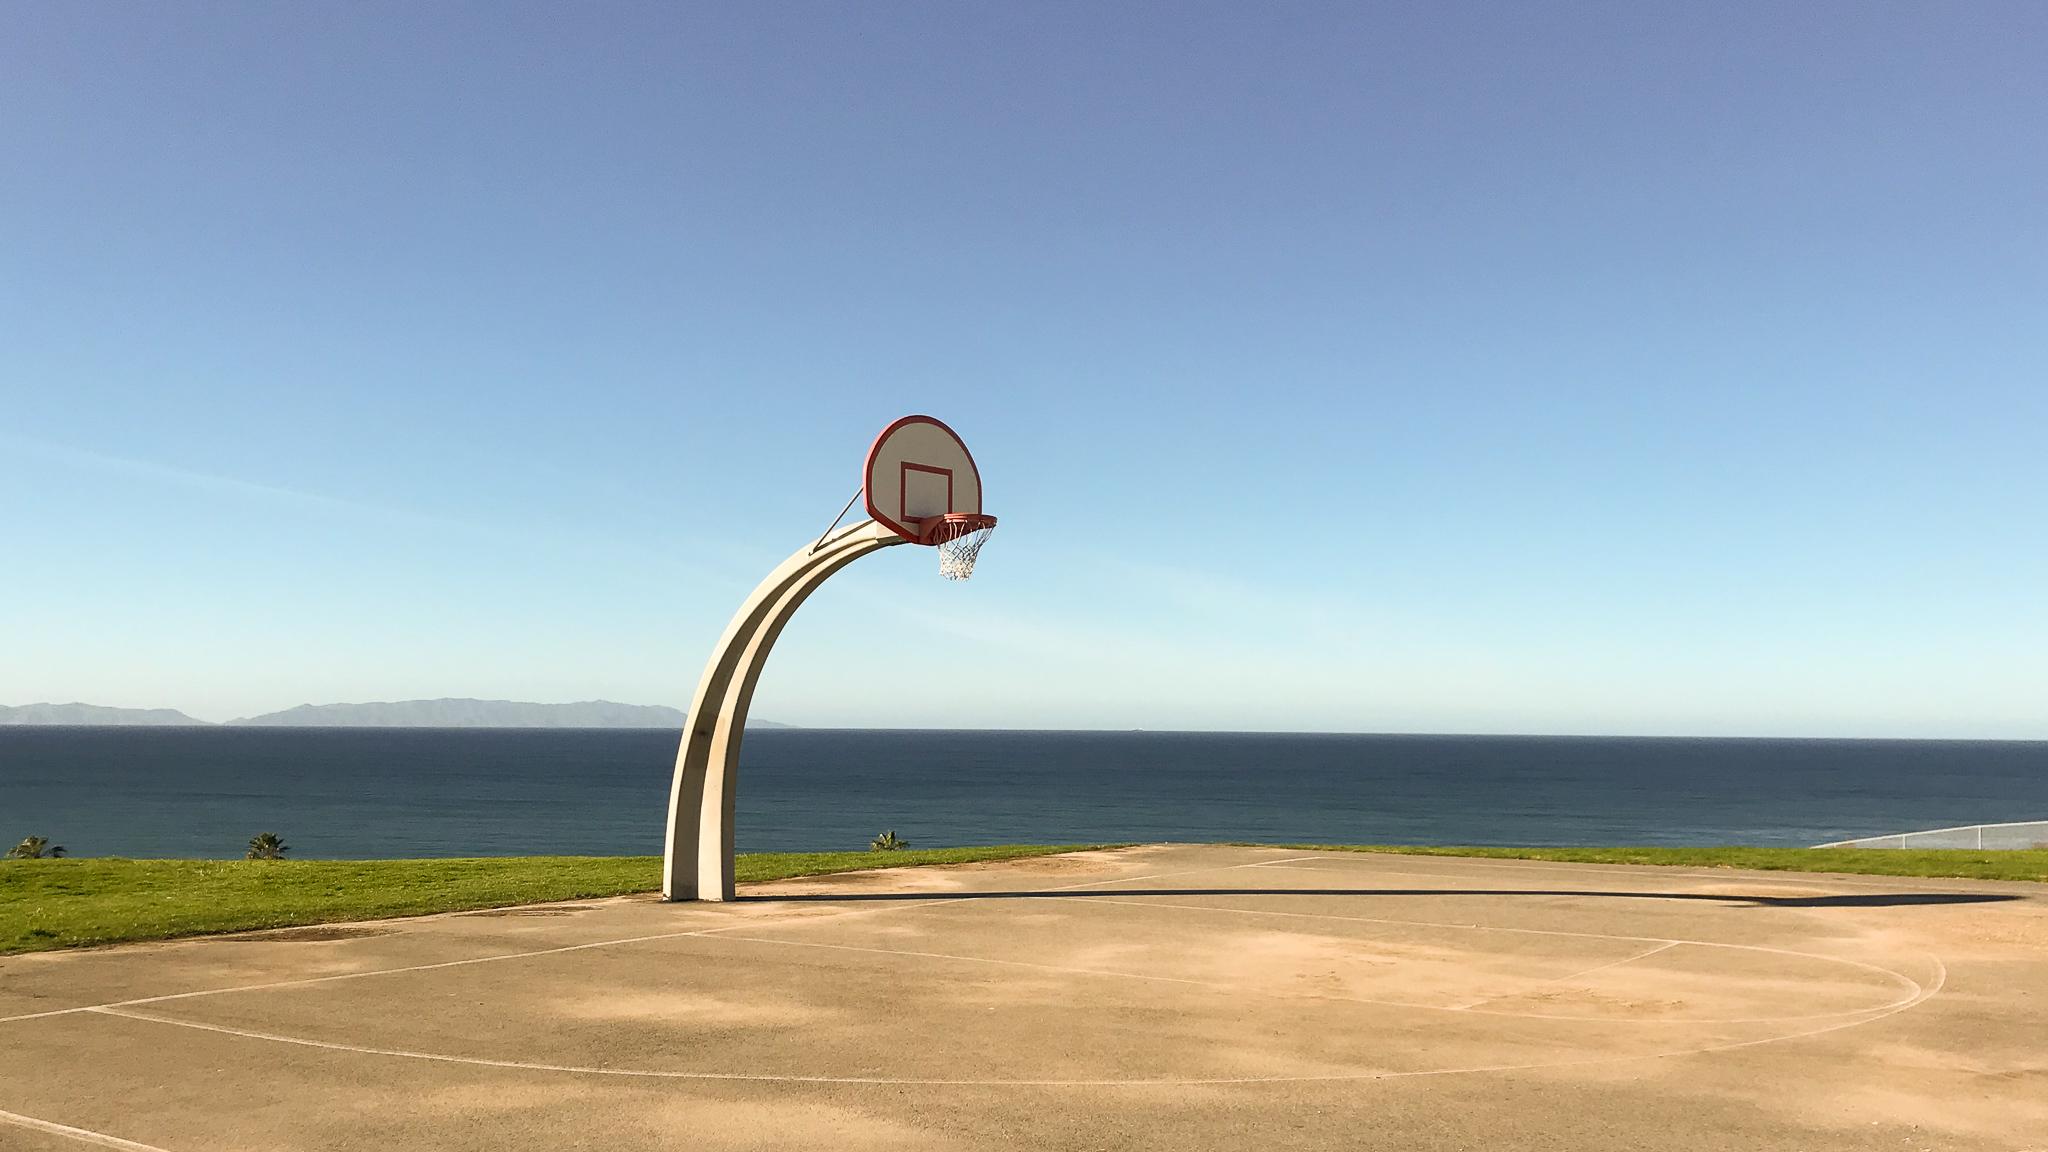 Angels Gate Park outdoor basketball court